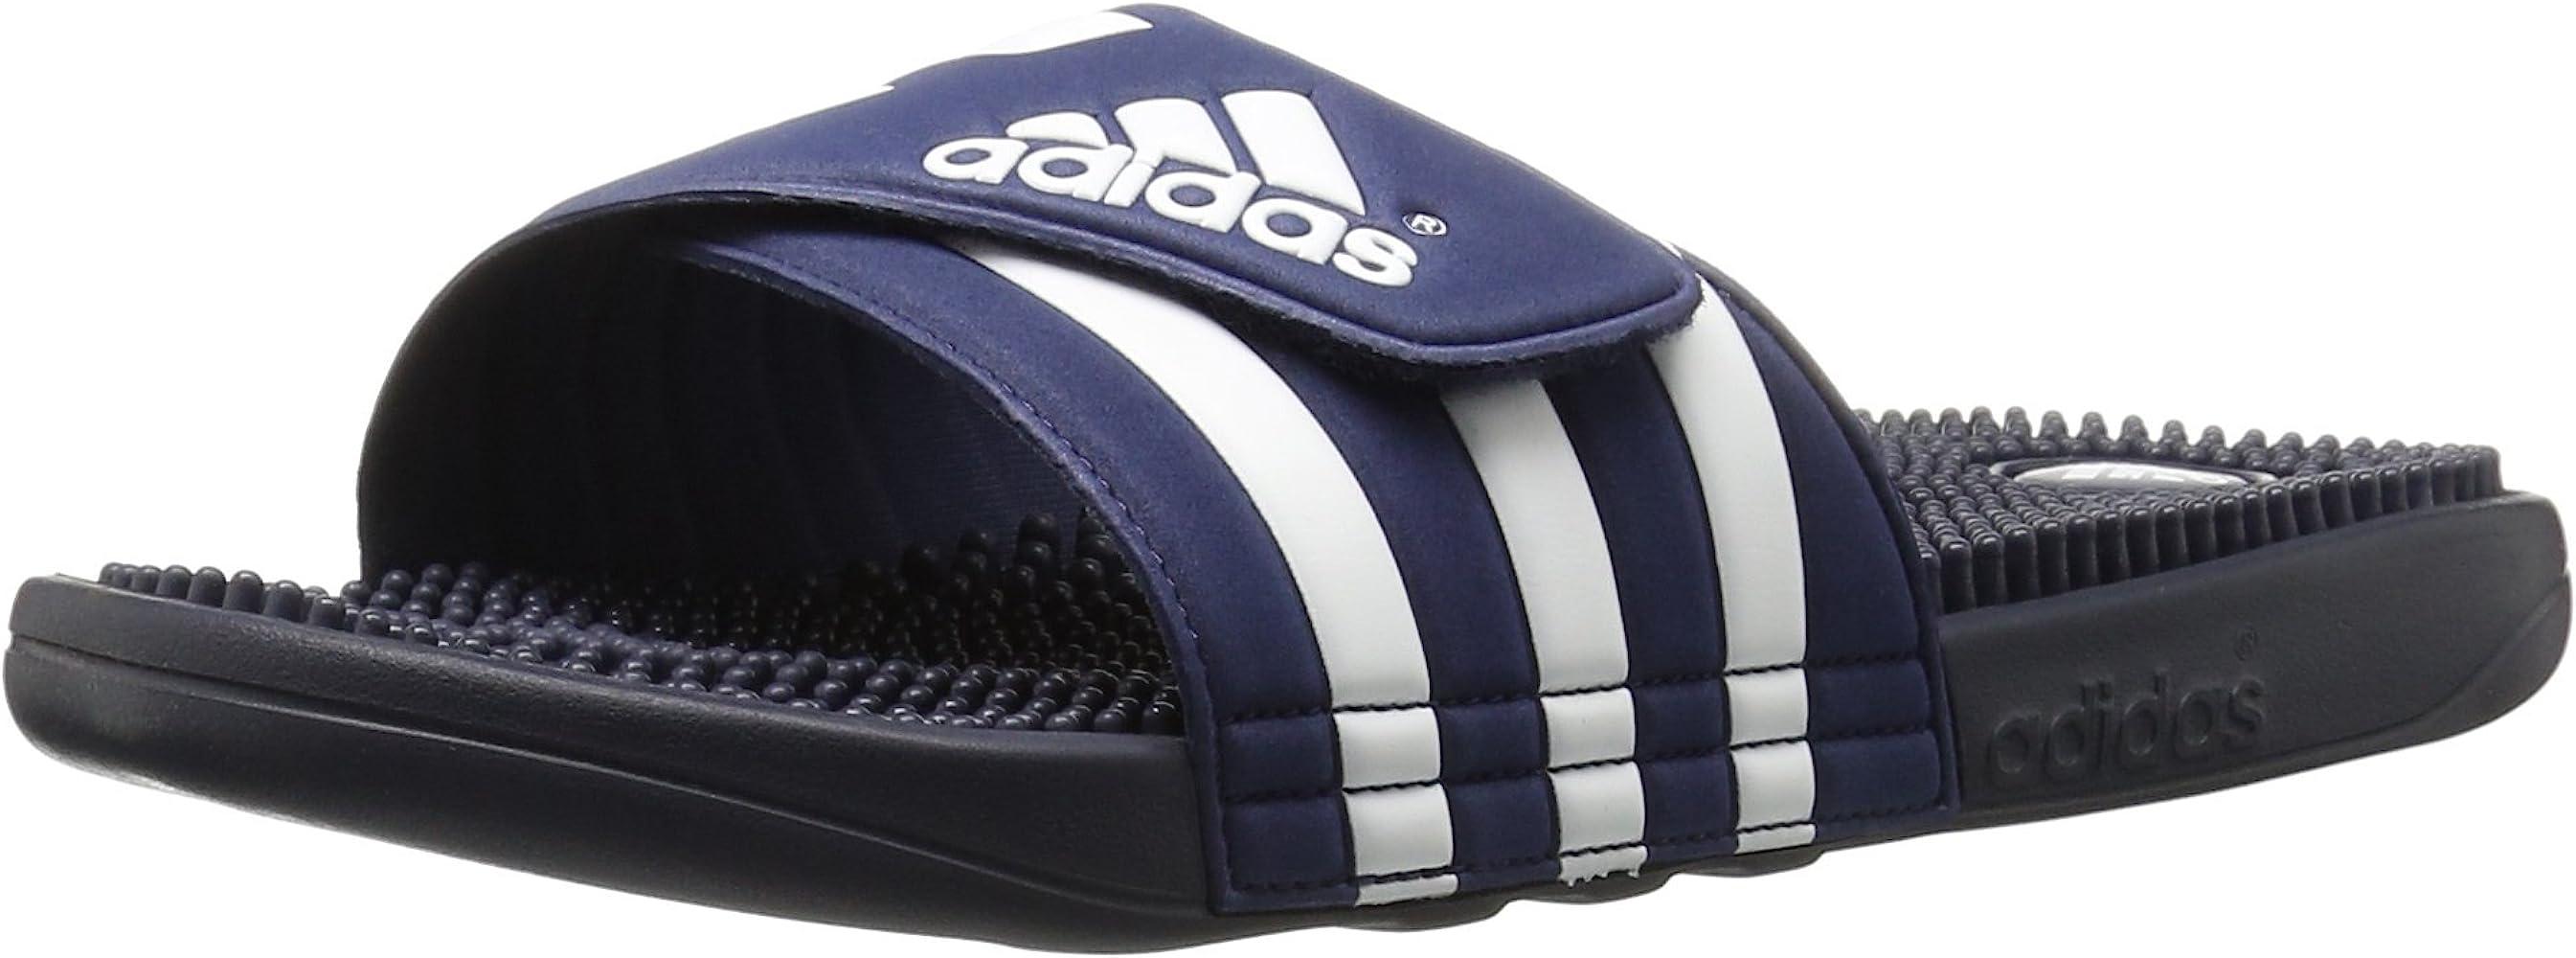 adidas slippers 10